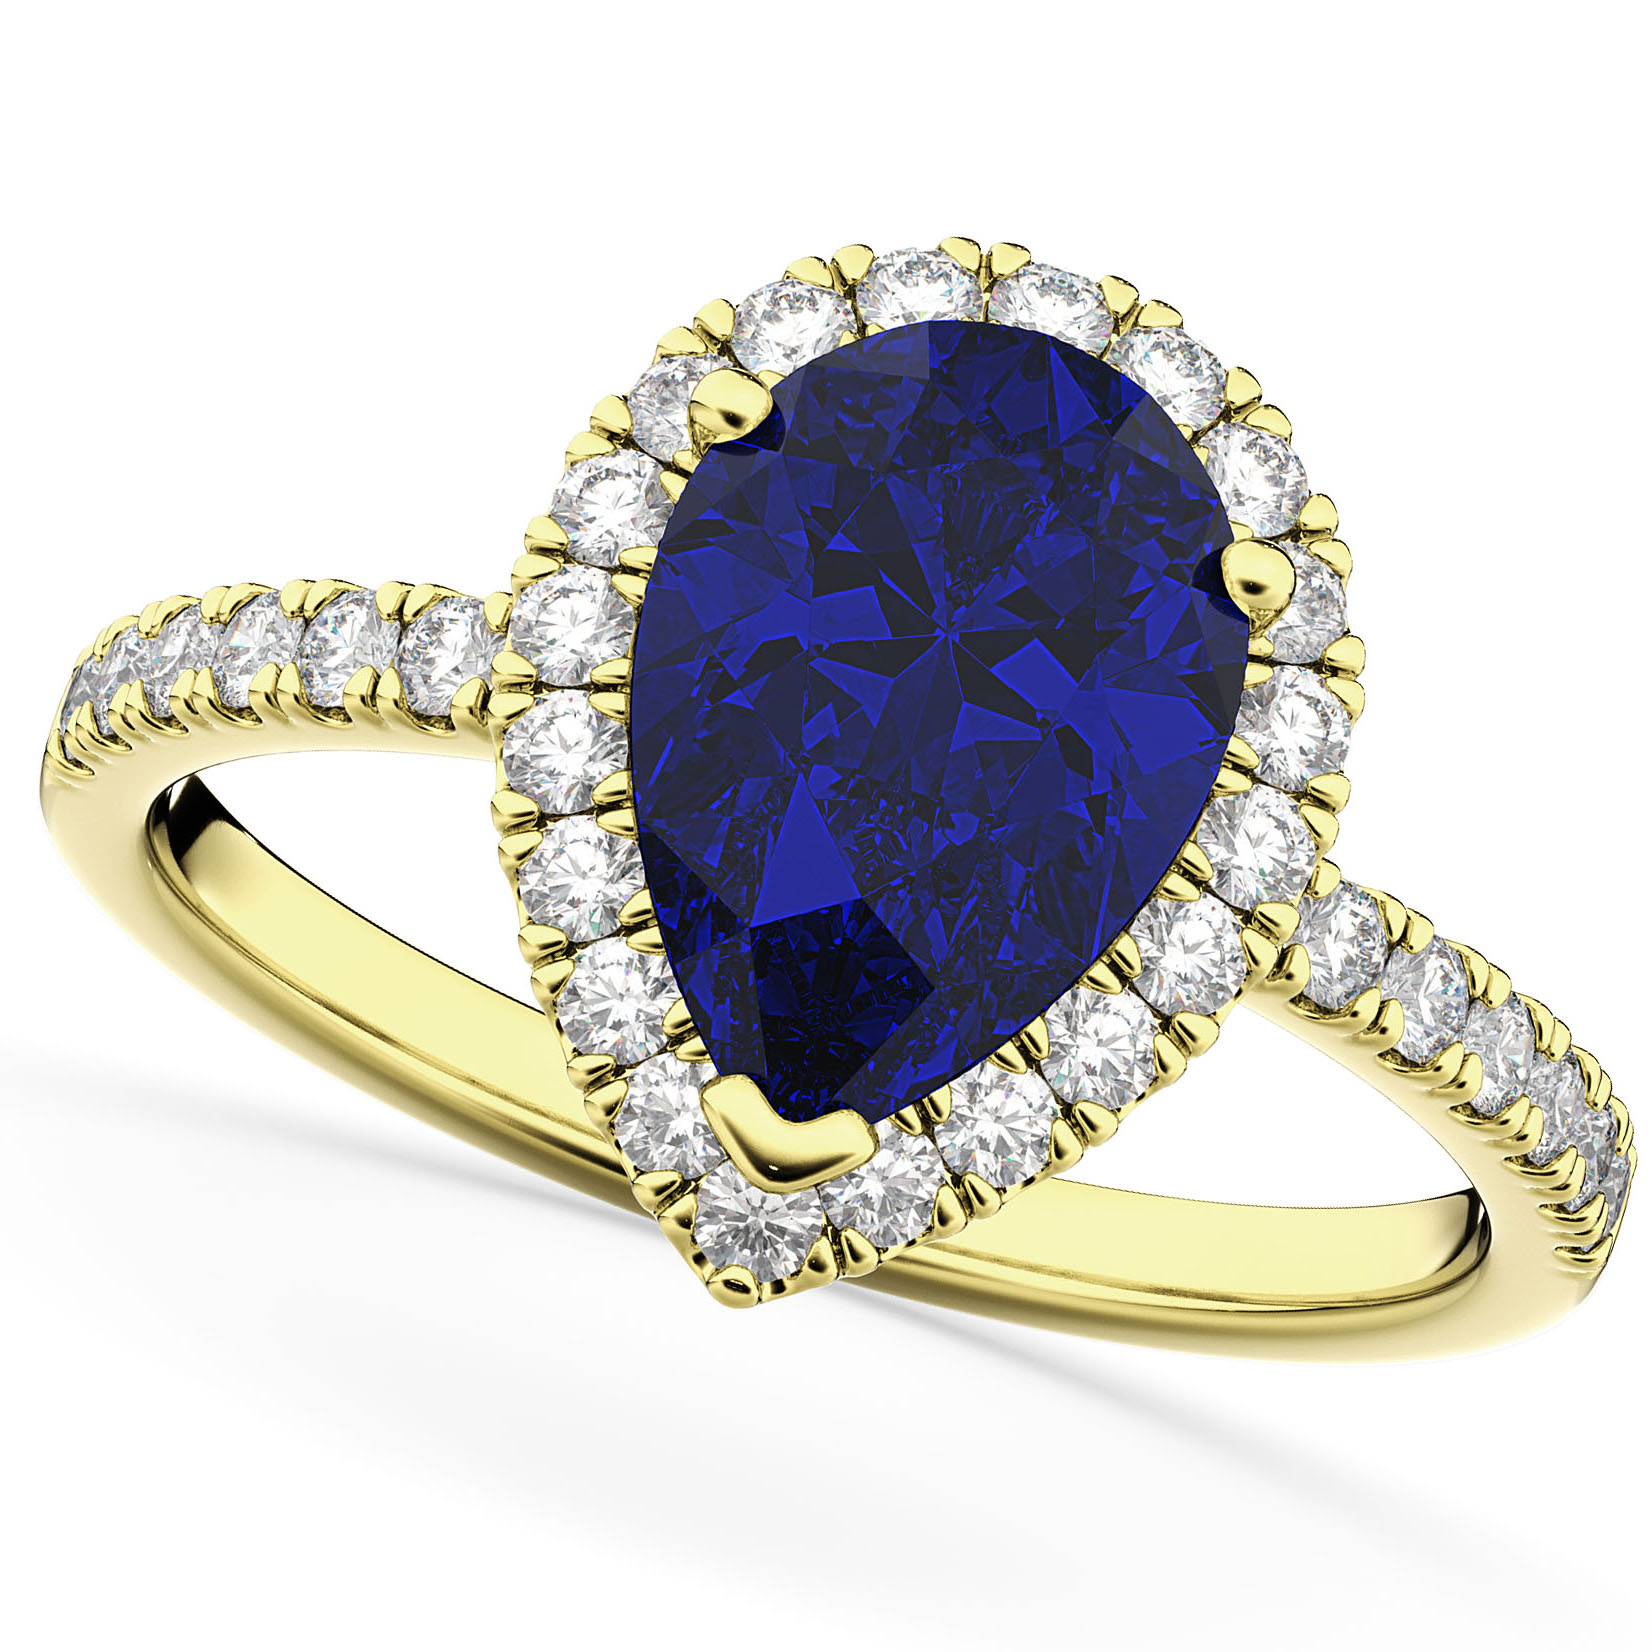 Pear Cut Halo Blue Sapphire & Diamond Engagement Ring 14K Yellow Gold 3.01ct